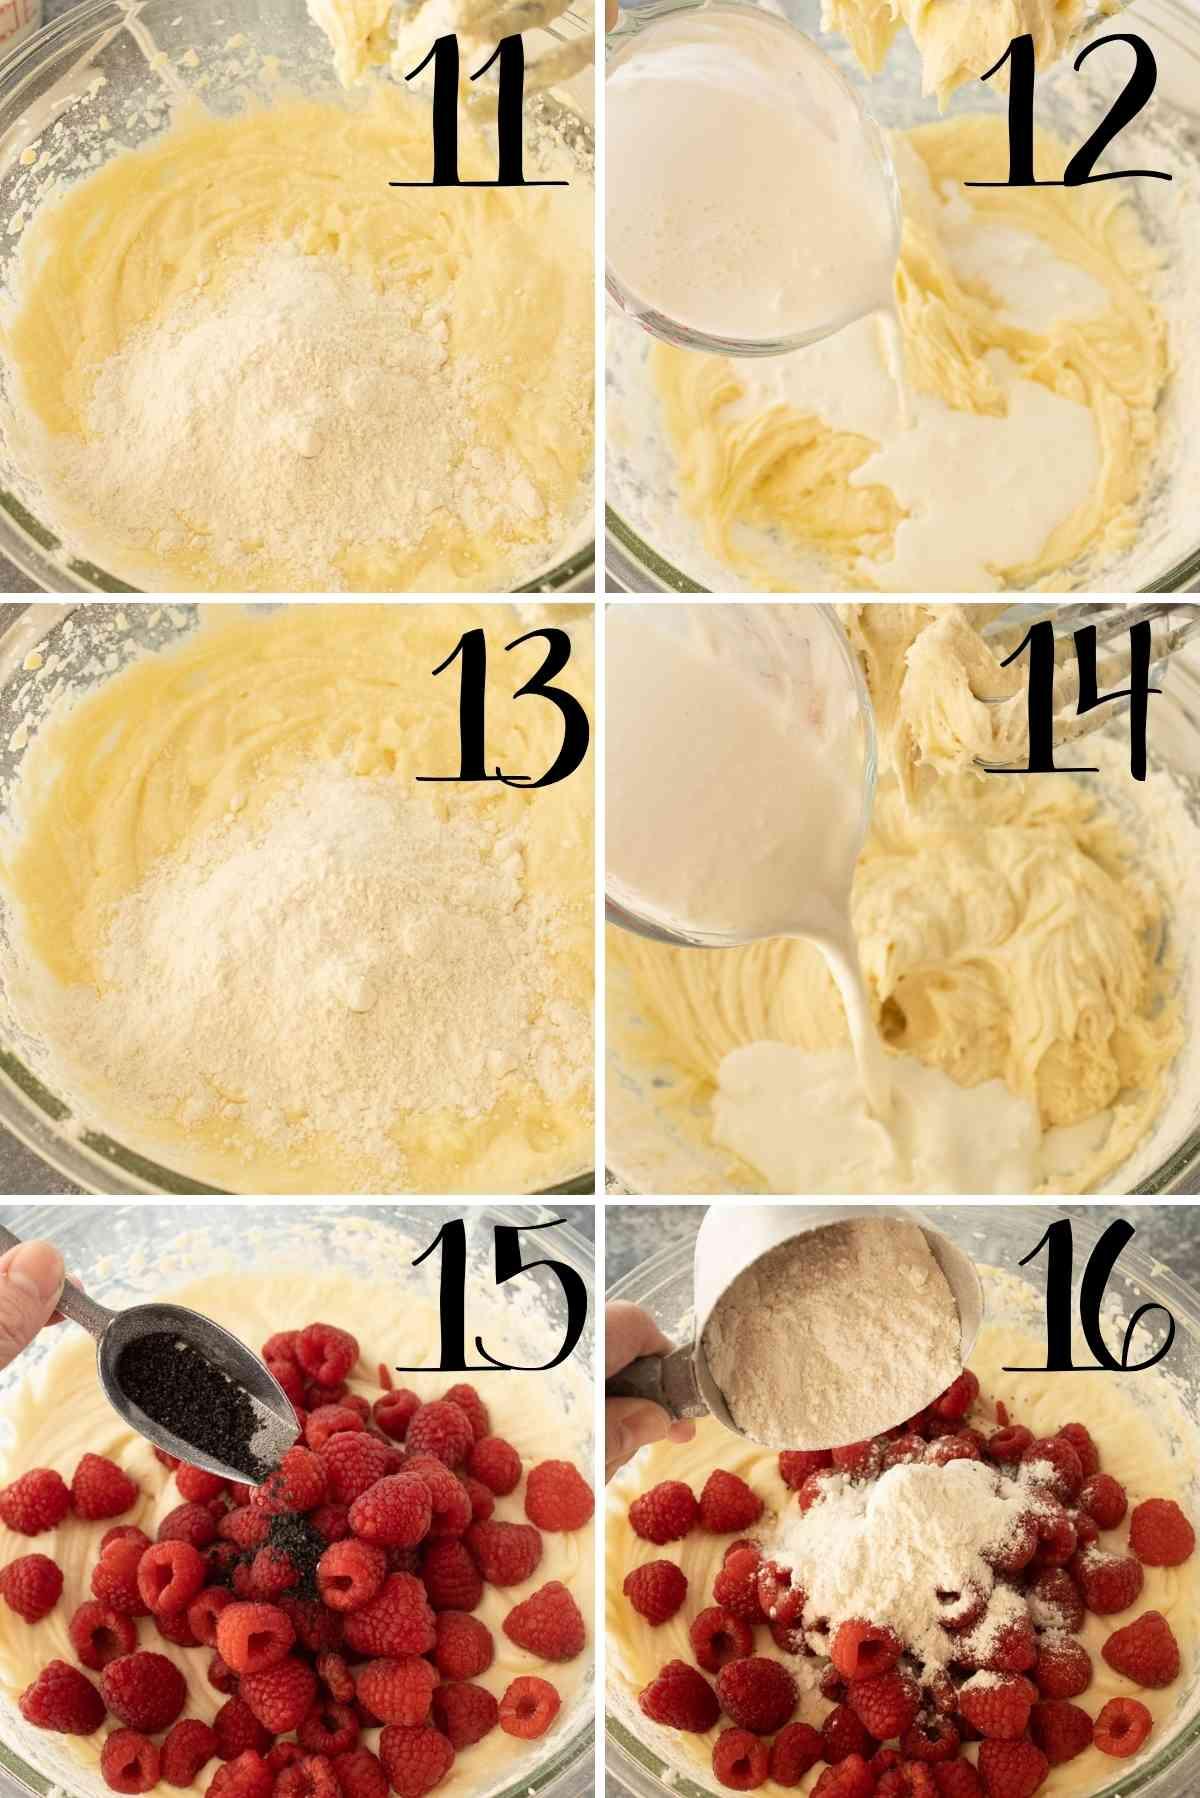 Milk/sour cream added alternately with flour.